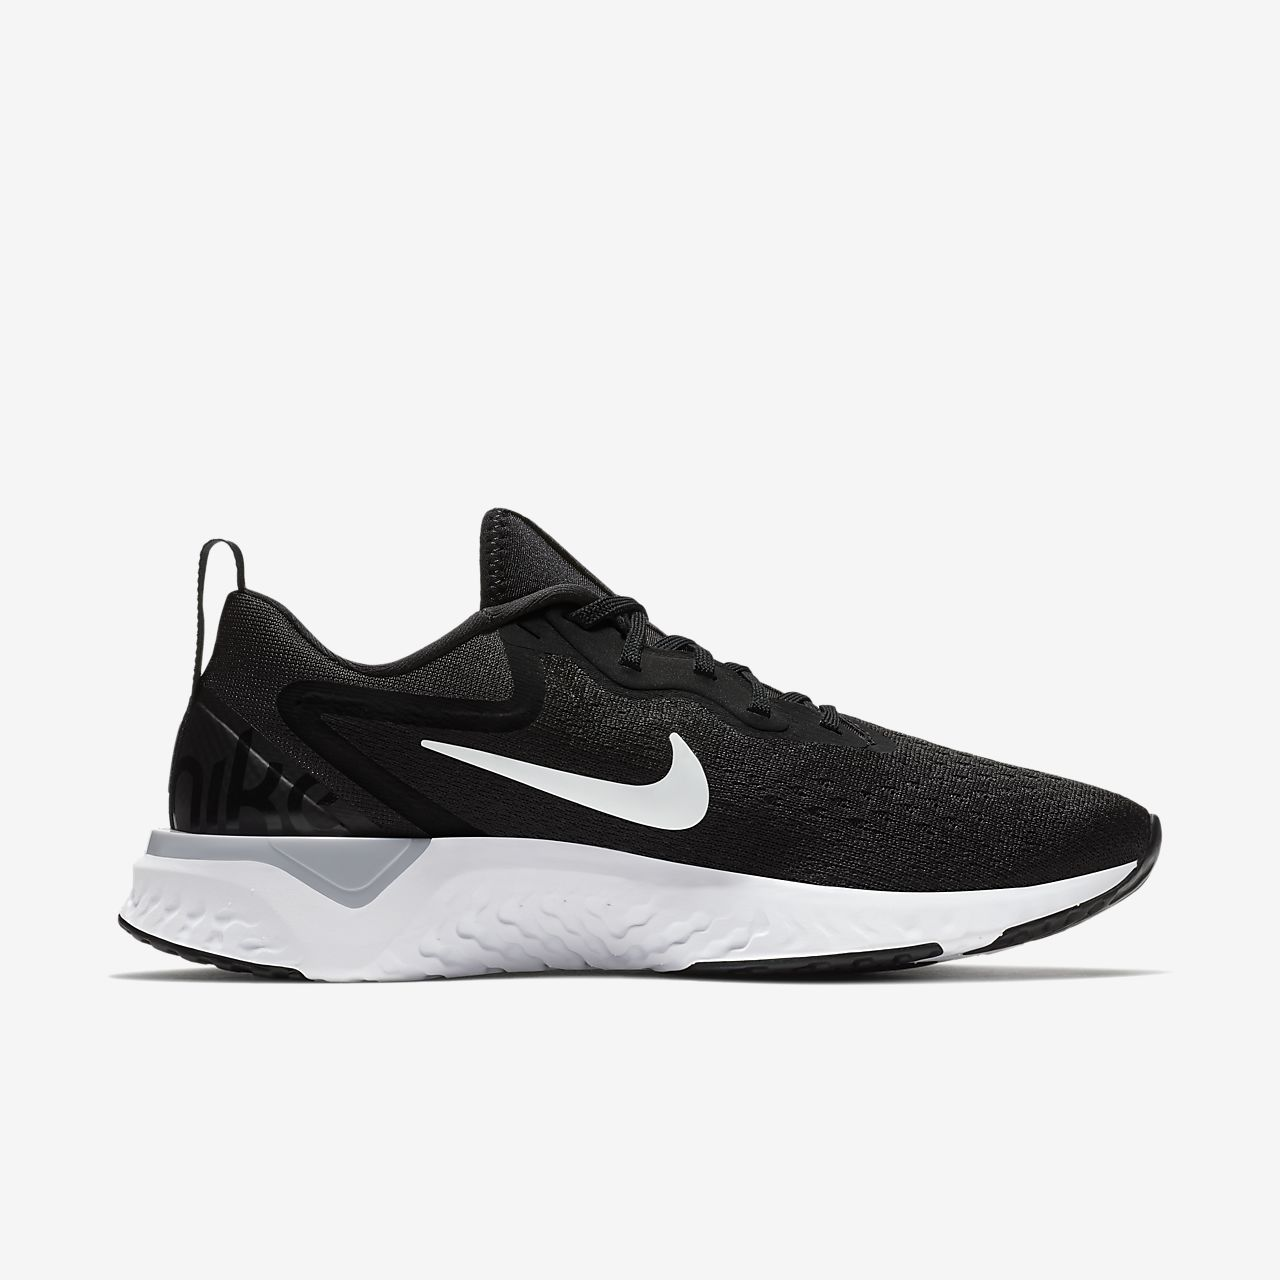 Nike Uomo Scarpe da corsa Nike Nike Odyssey REAGIRE NERO BIANCO